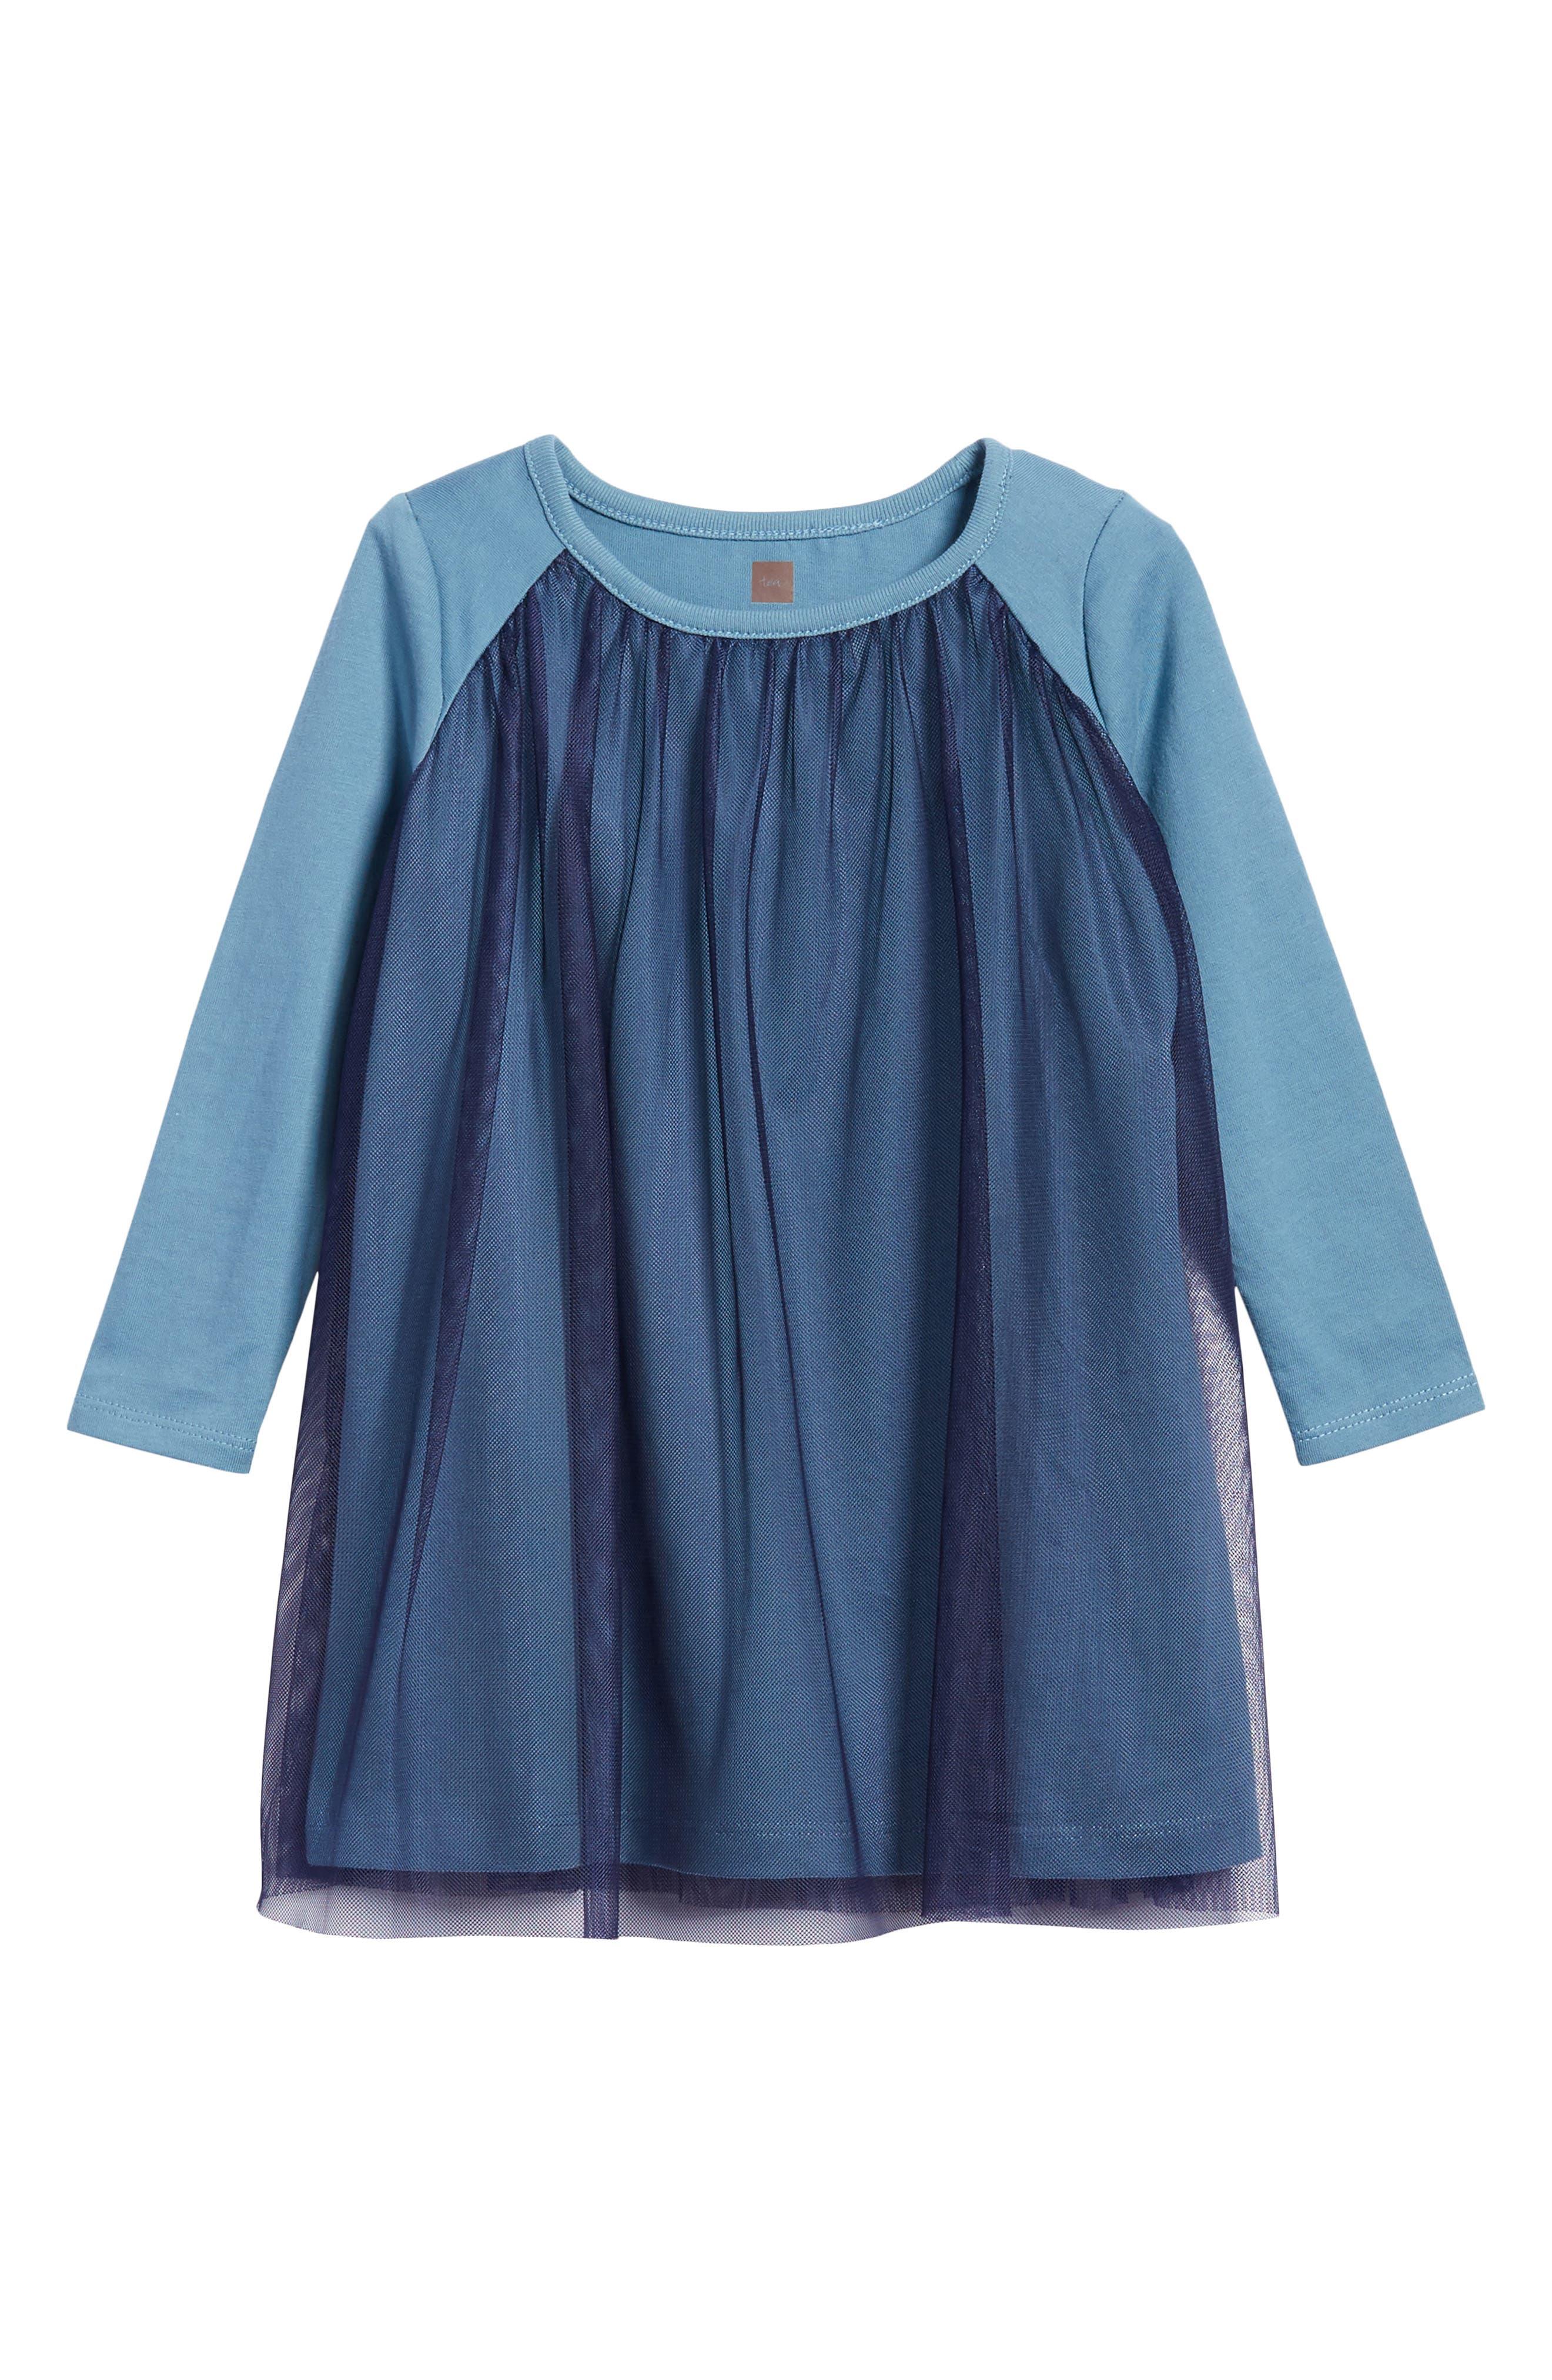 Tea Collection Mackenzie Tulle Dress (Toddler Girls, Little Girls & Big Girls)